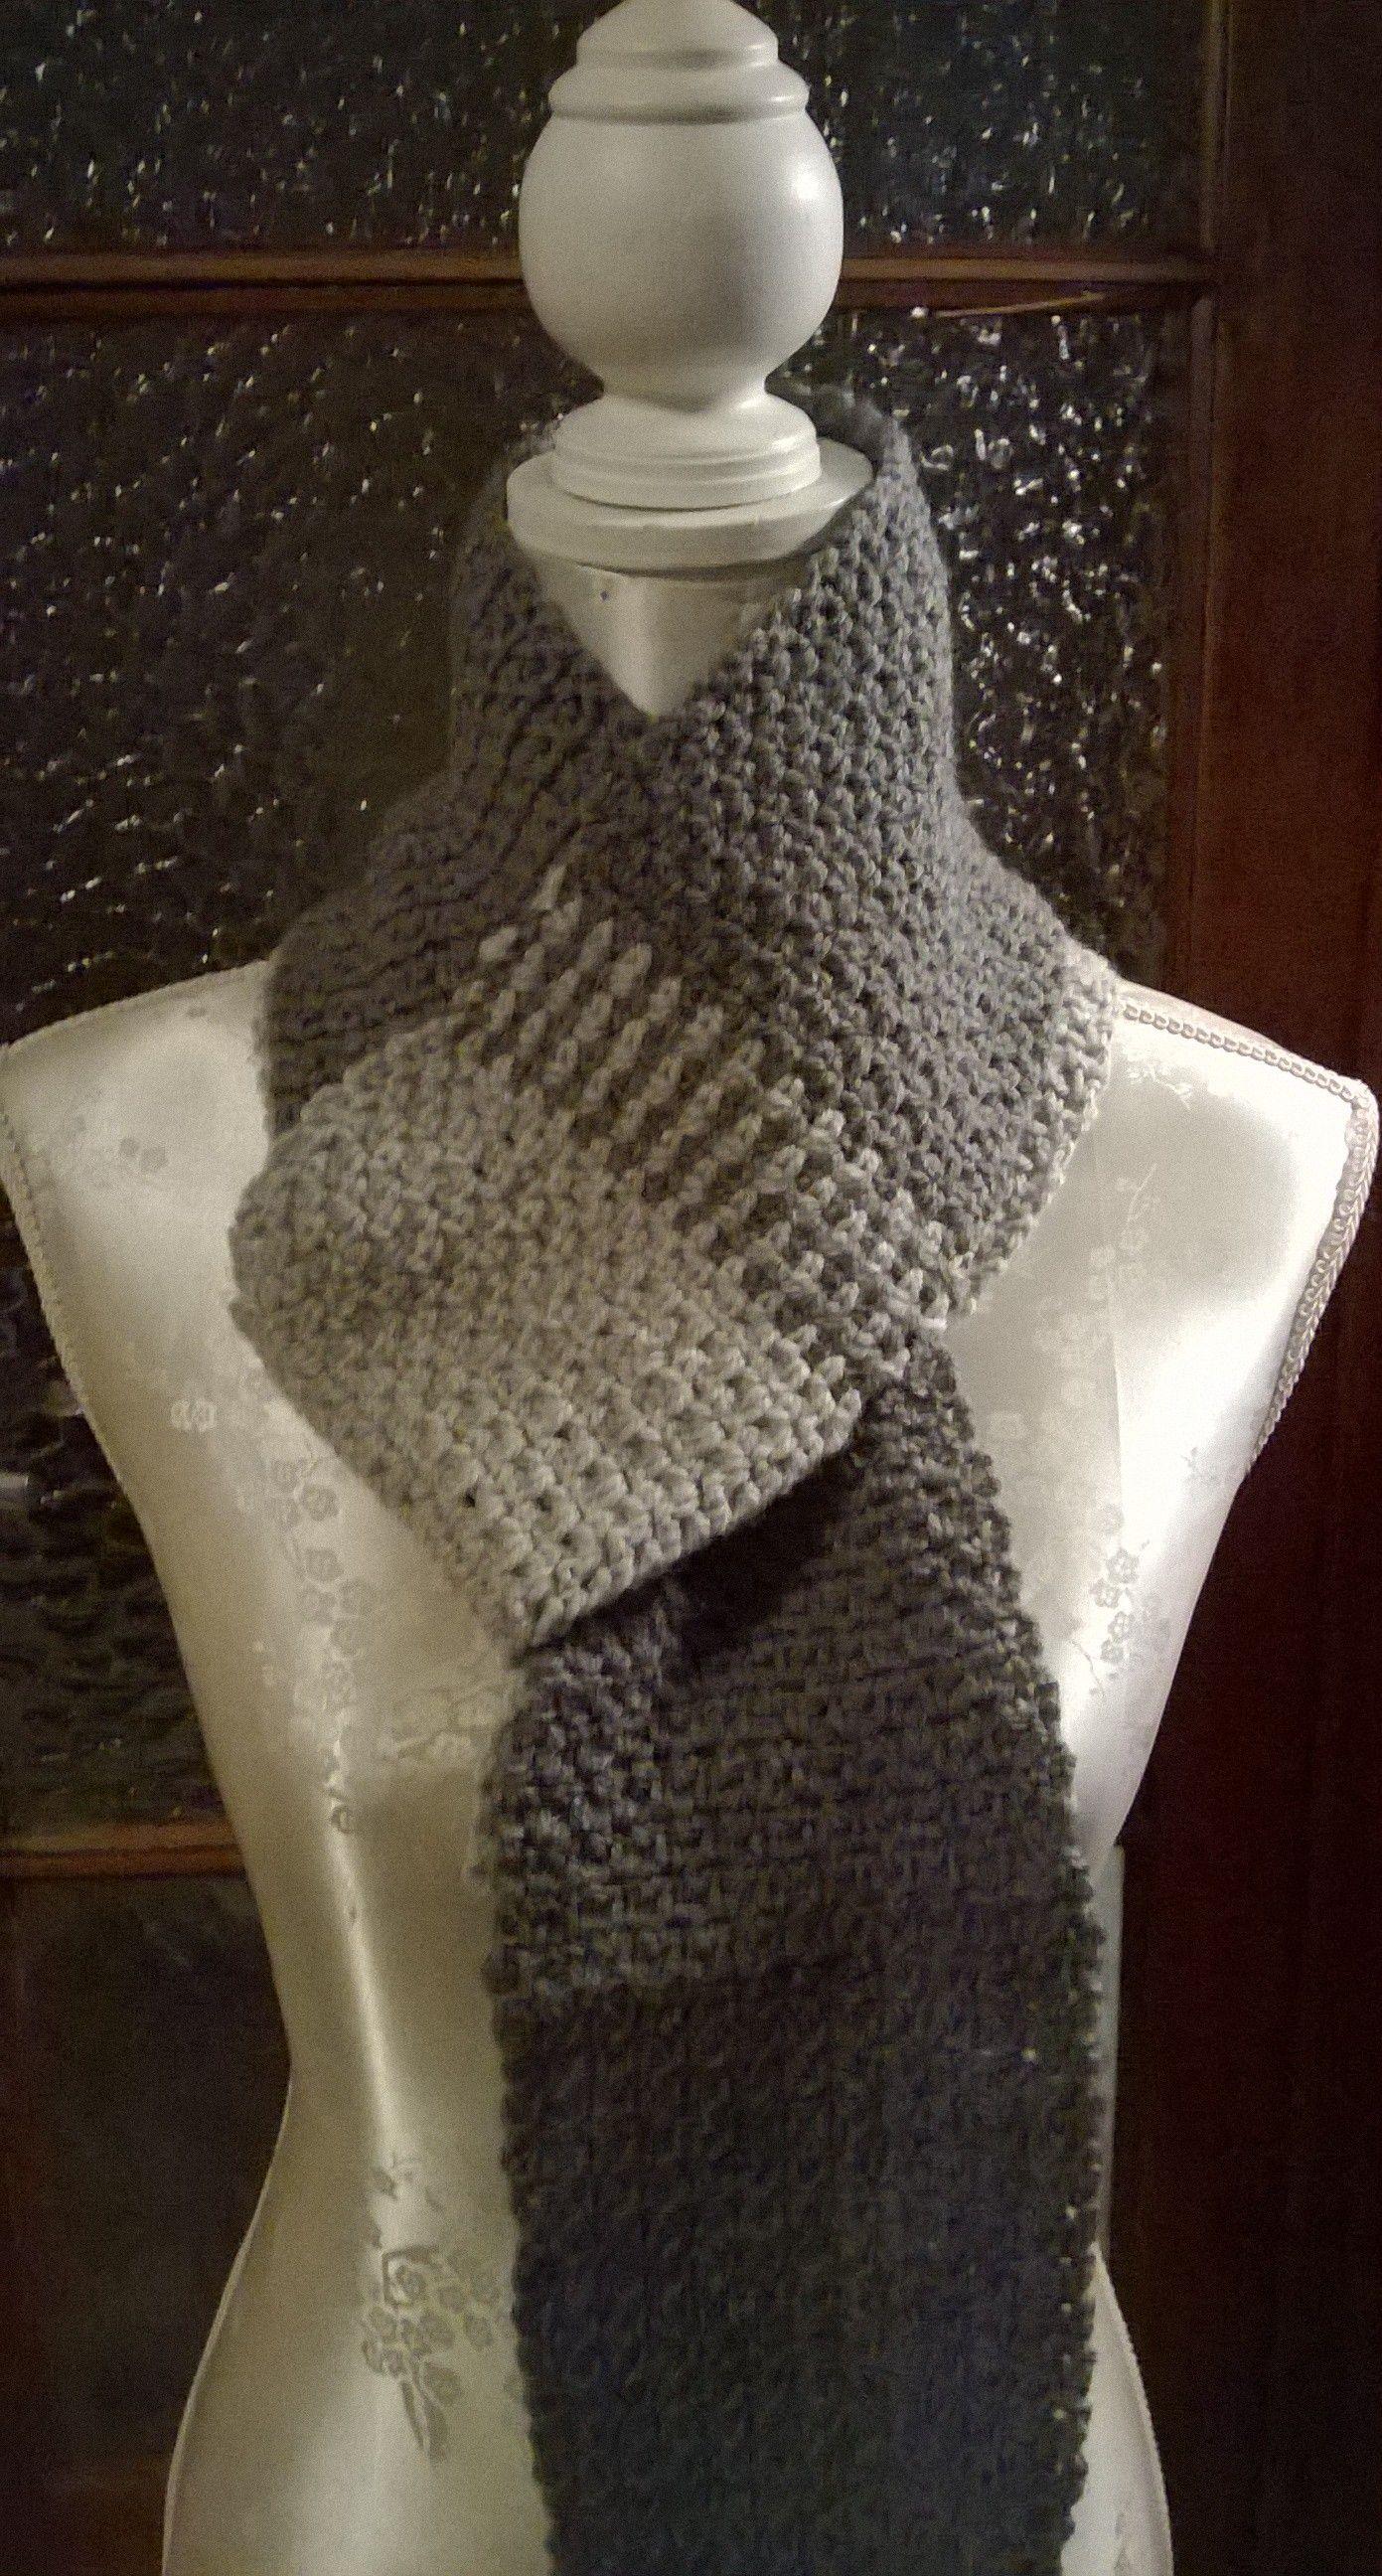 Pin de cijaber en Crochet | Pinterest | Gorros